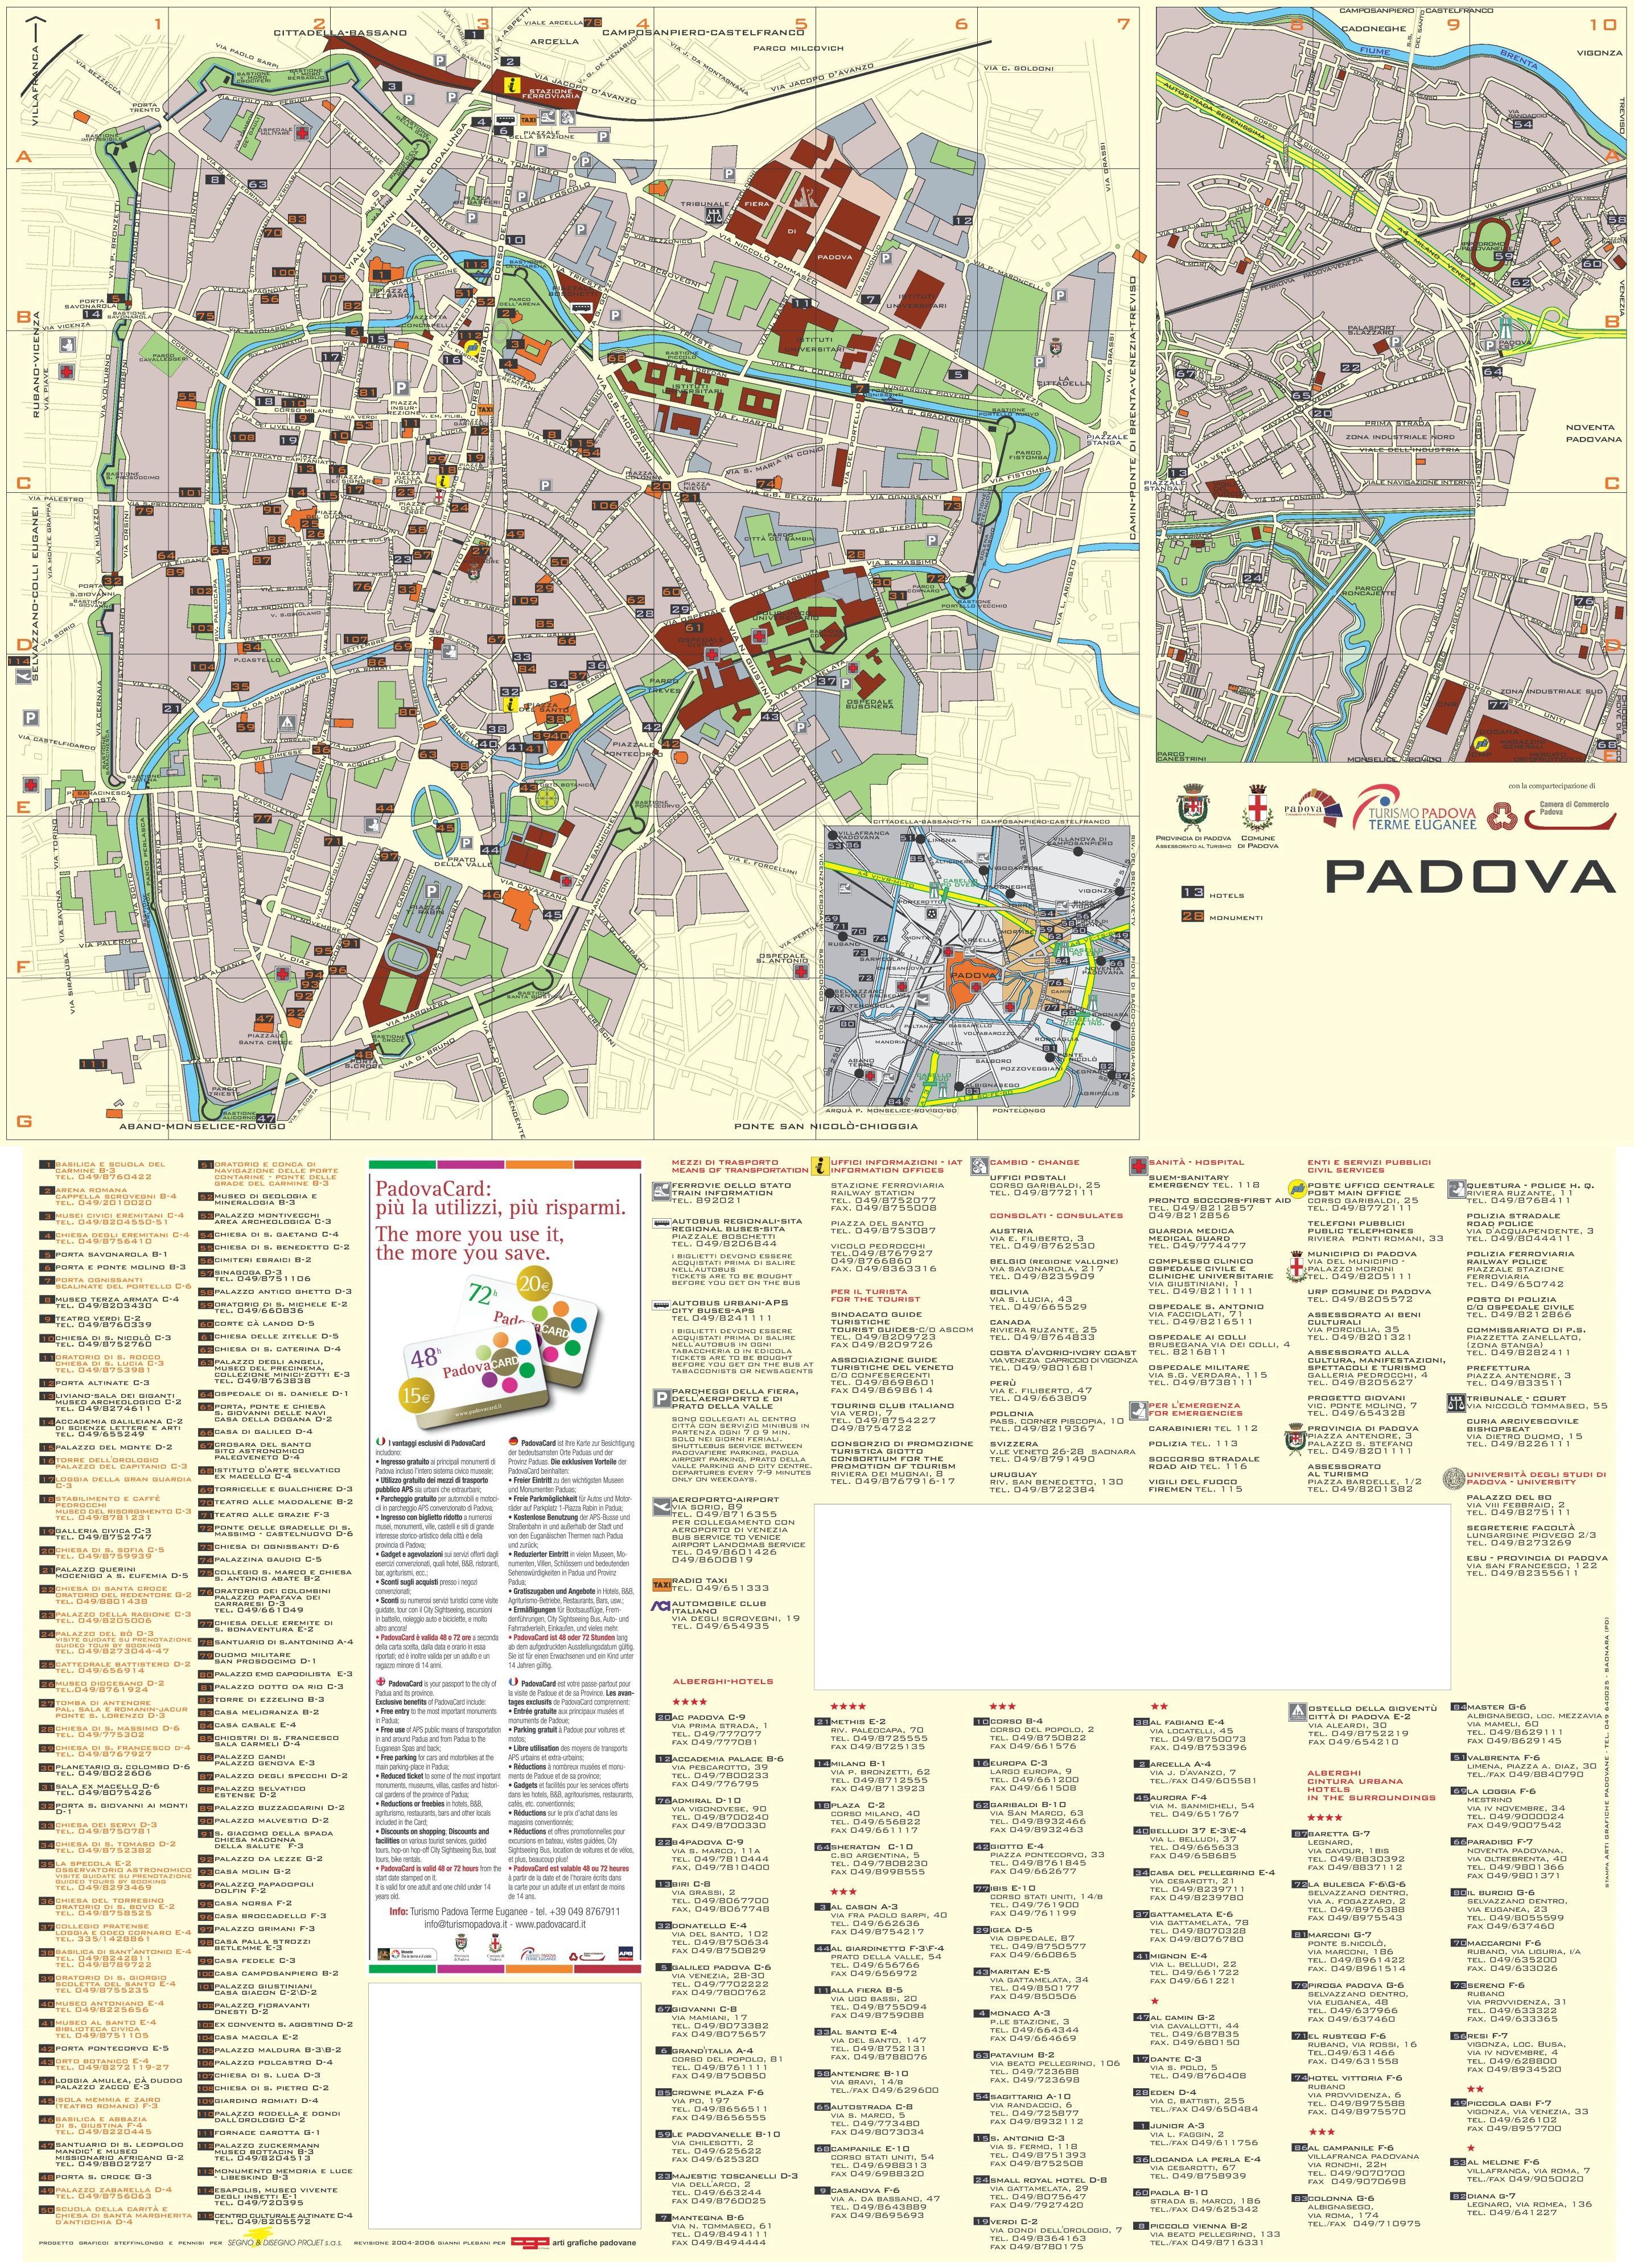 Pin by Ewa Naczyska on Wochy 2017 Pinterest Tourist map